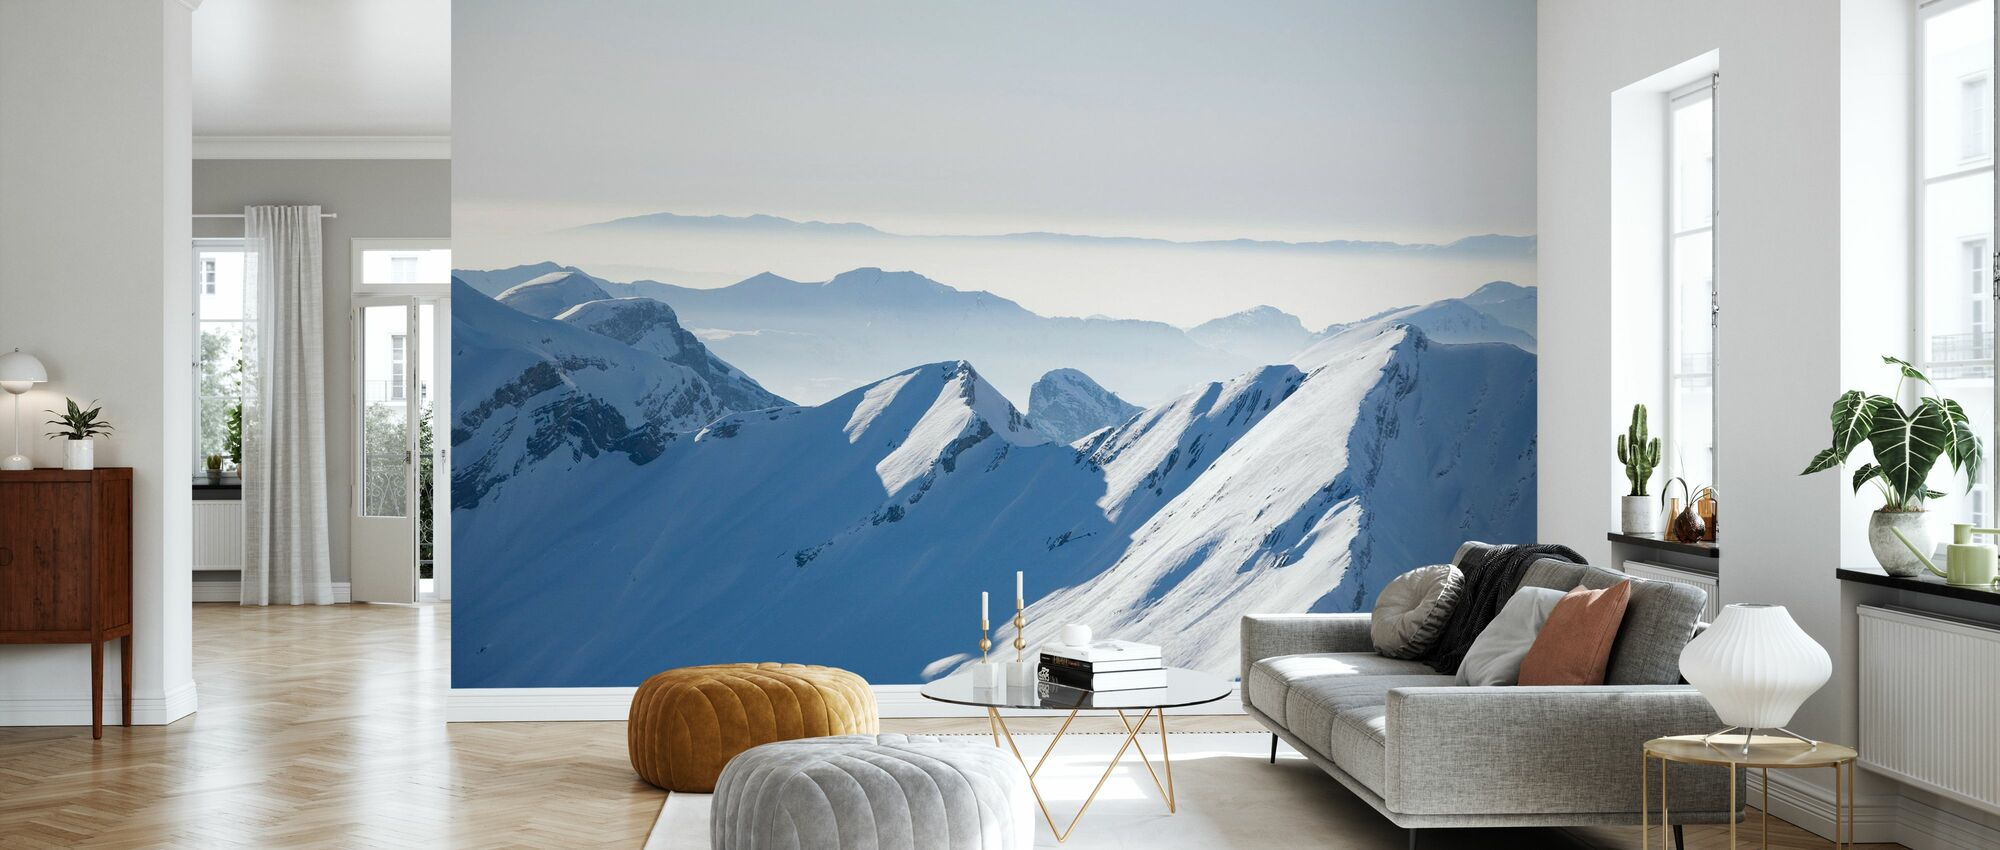 Chamonix Alps I, France - Wallpaper - Living Room